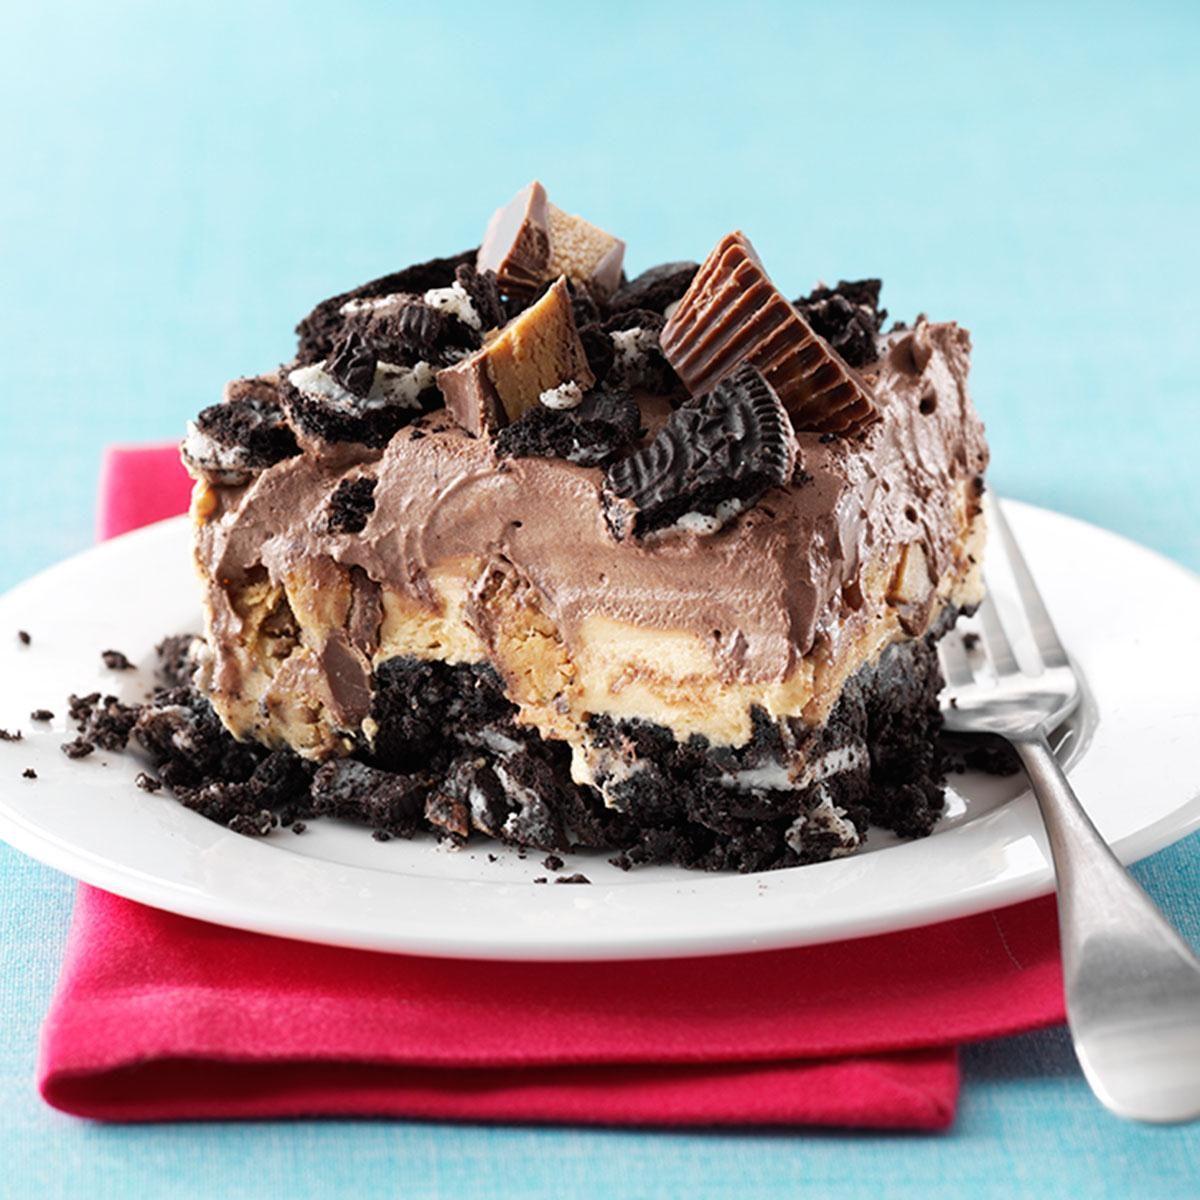 Peanut Butter Chocolate Dessert Recipe Taste Of Home